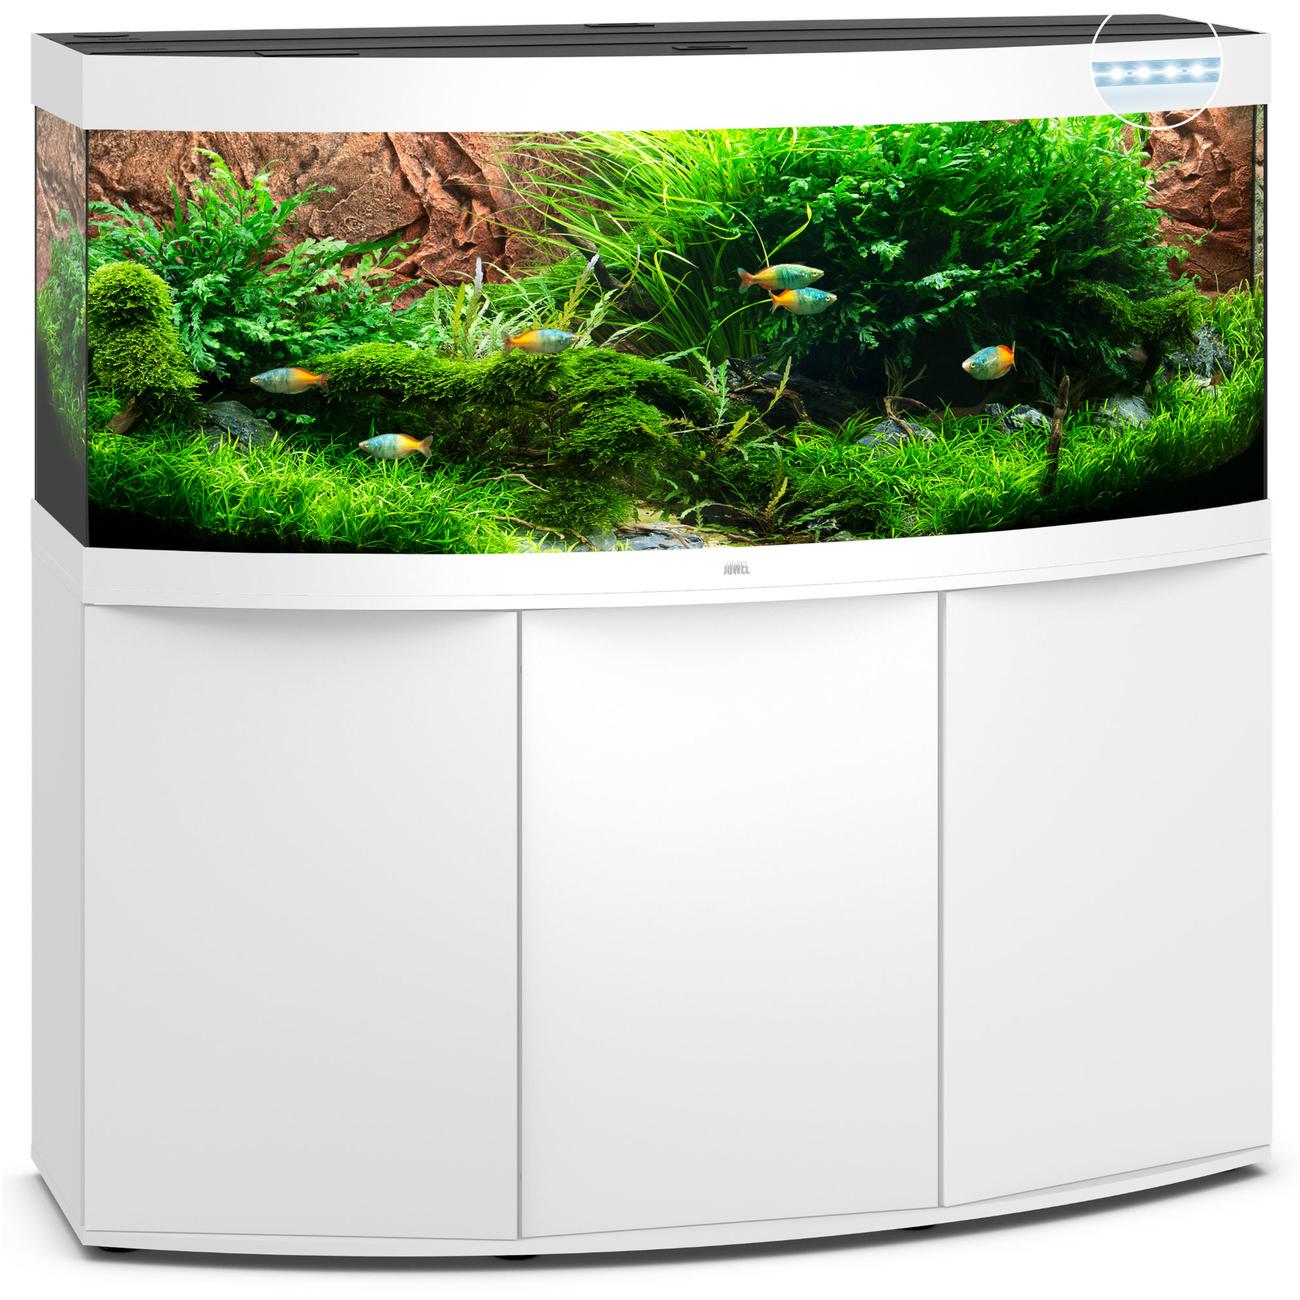 Juwel Vision 450 LED Aquarium mit Unterschrank, Bild 8